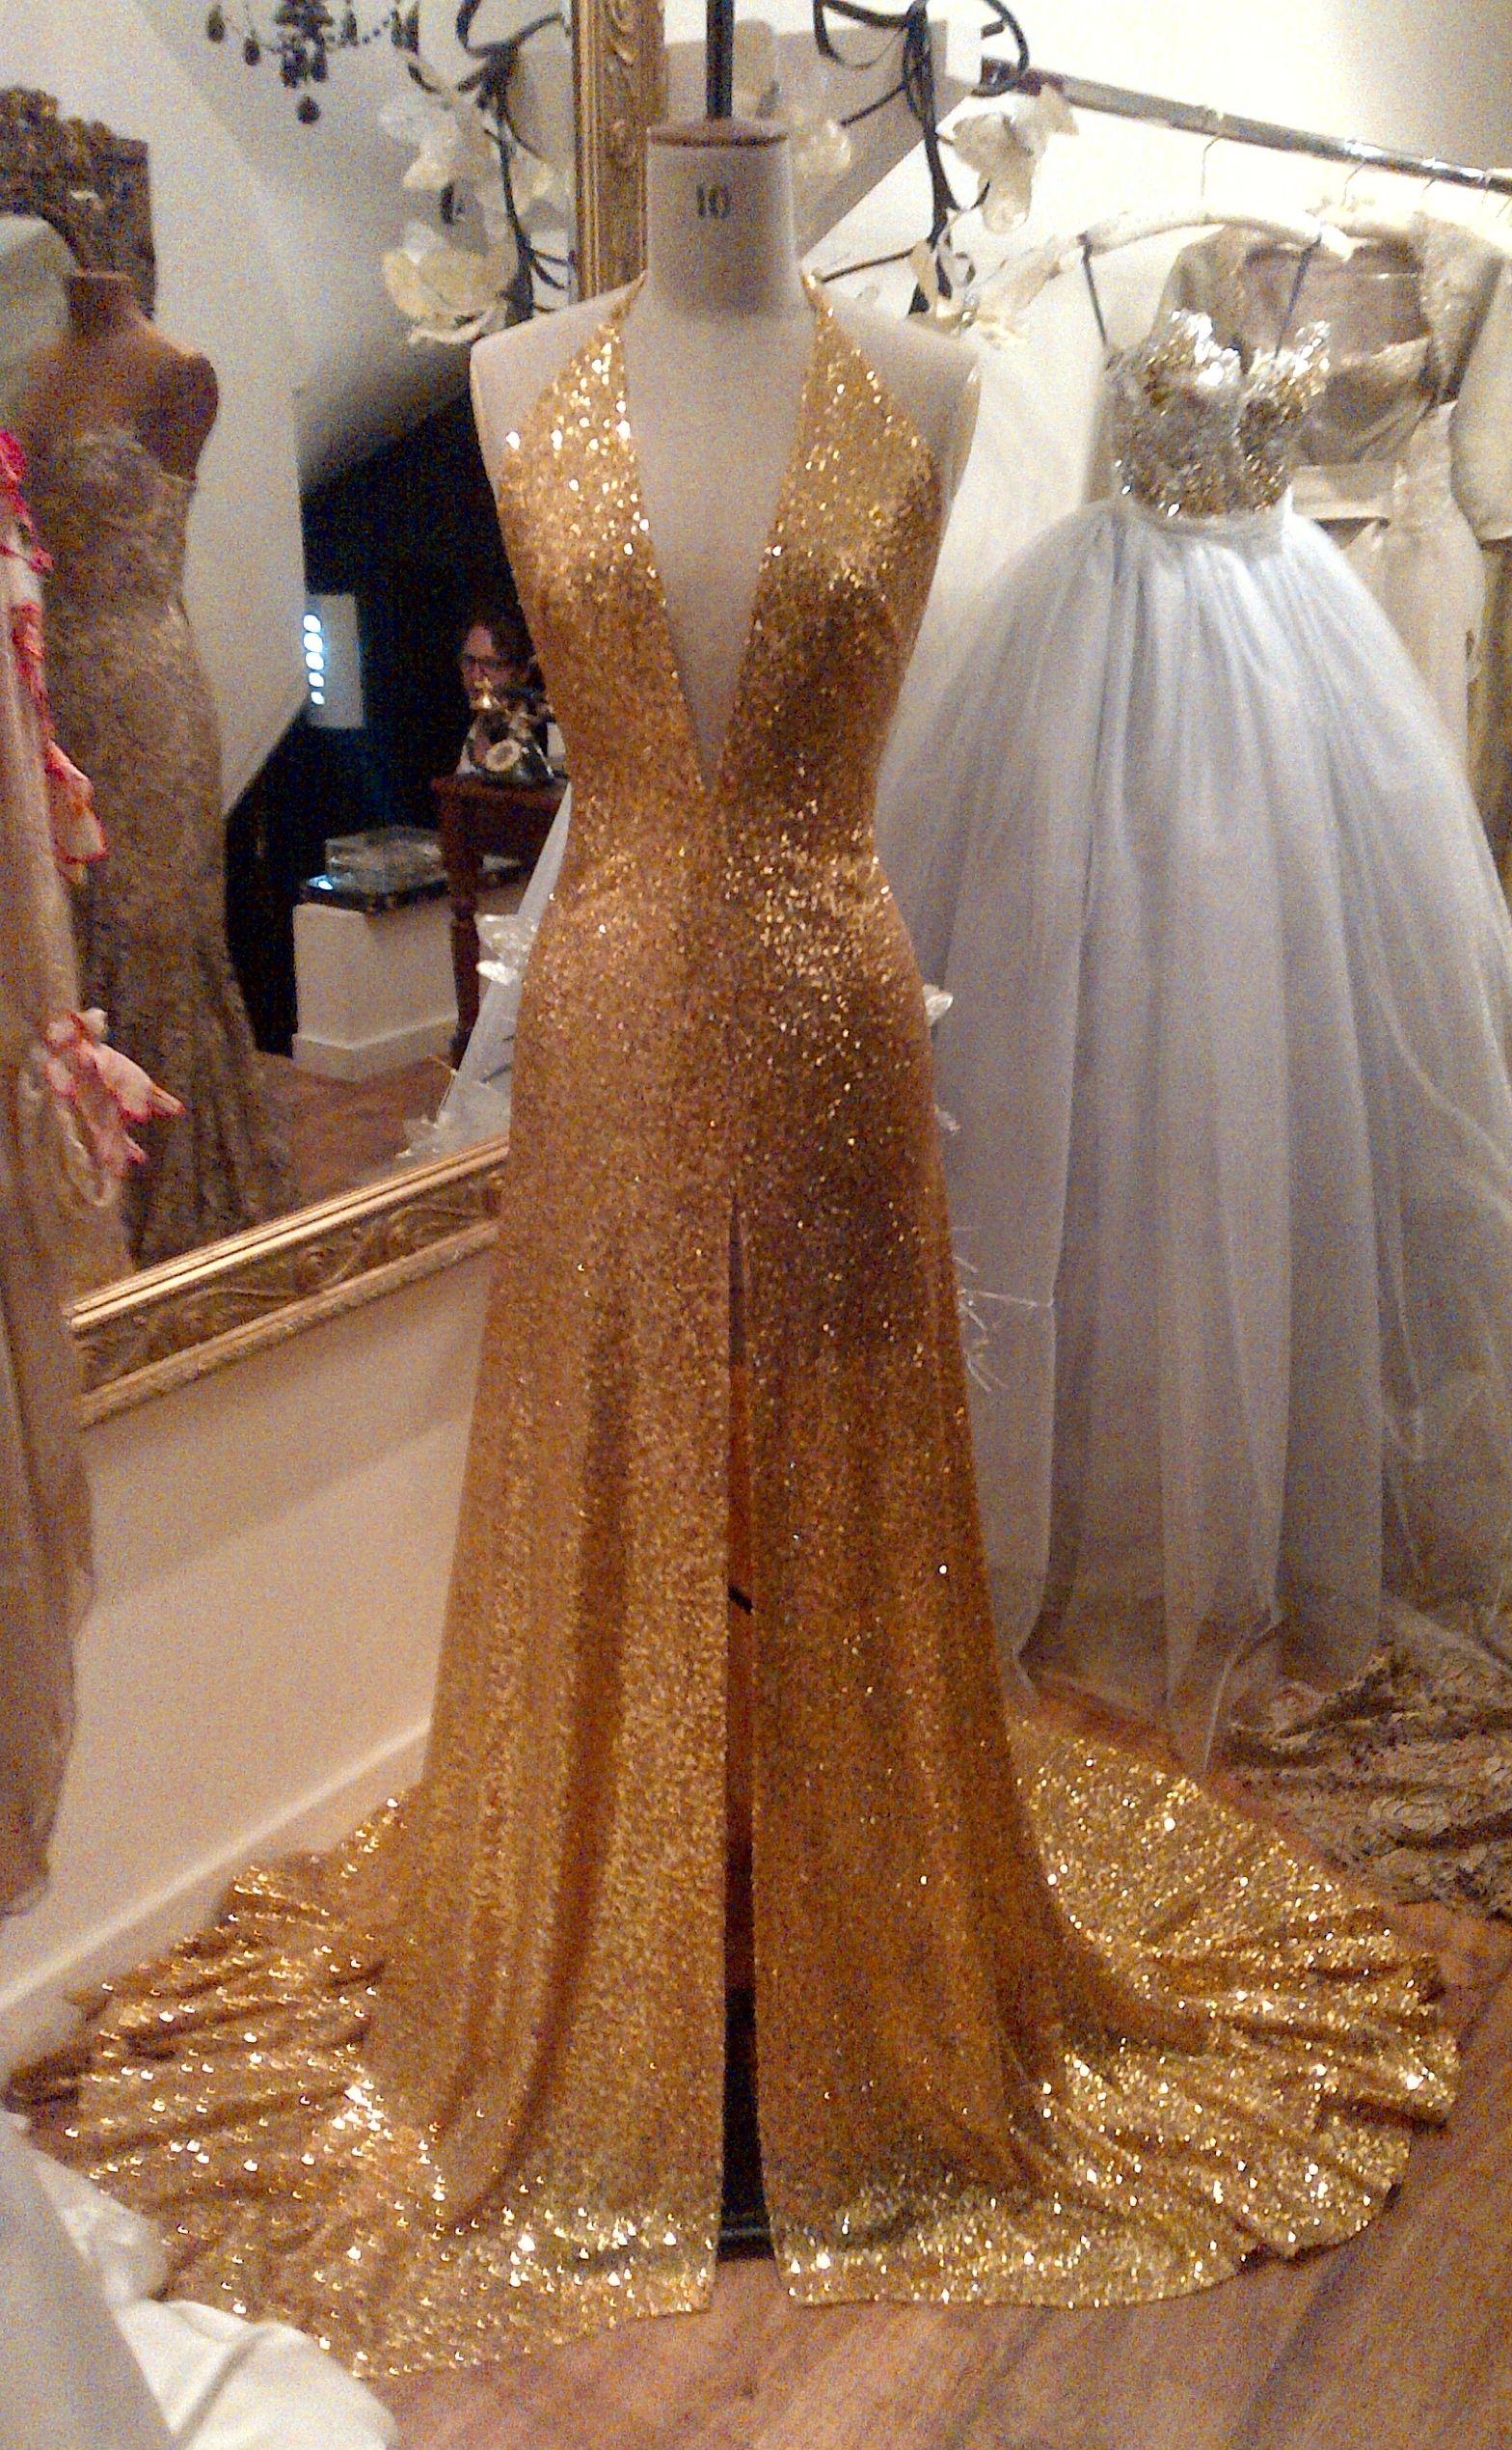 Gold blue wedding dress gown lauren b couturewedding gowns